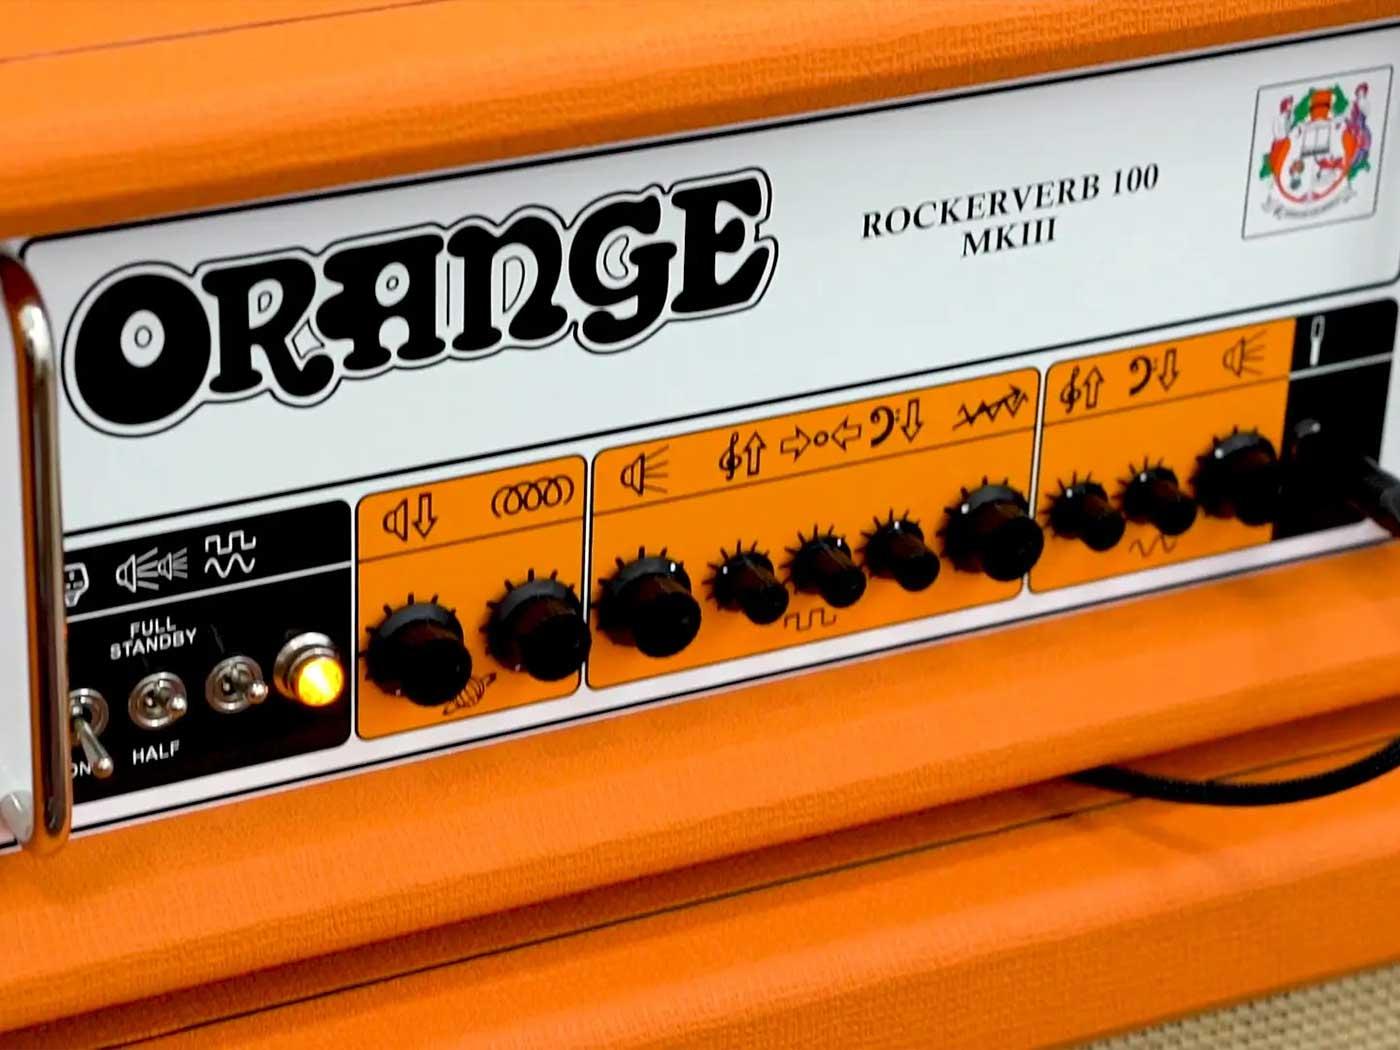 The Orange Rockerverb MkIII